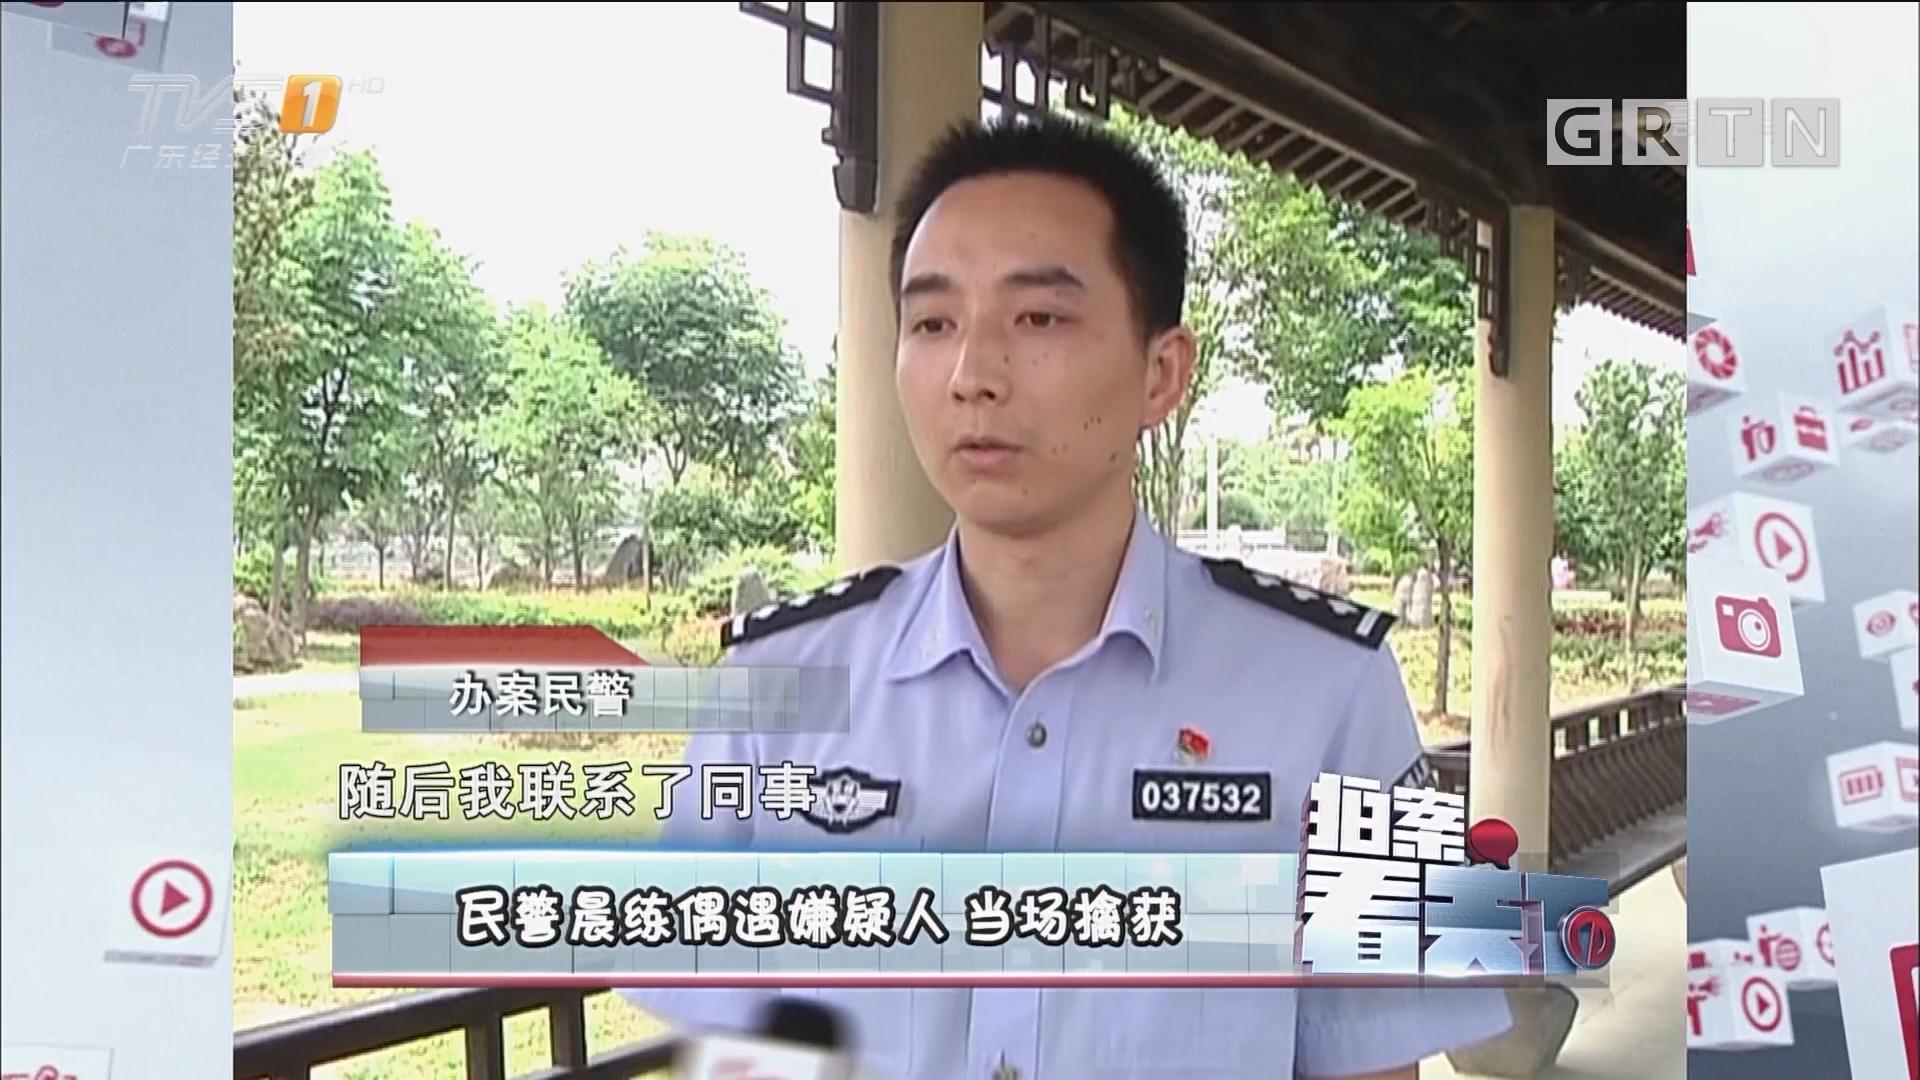 [HD][2017-06-05]拍案看天下:民警晨练偶遇嫌疑人 当场擒获